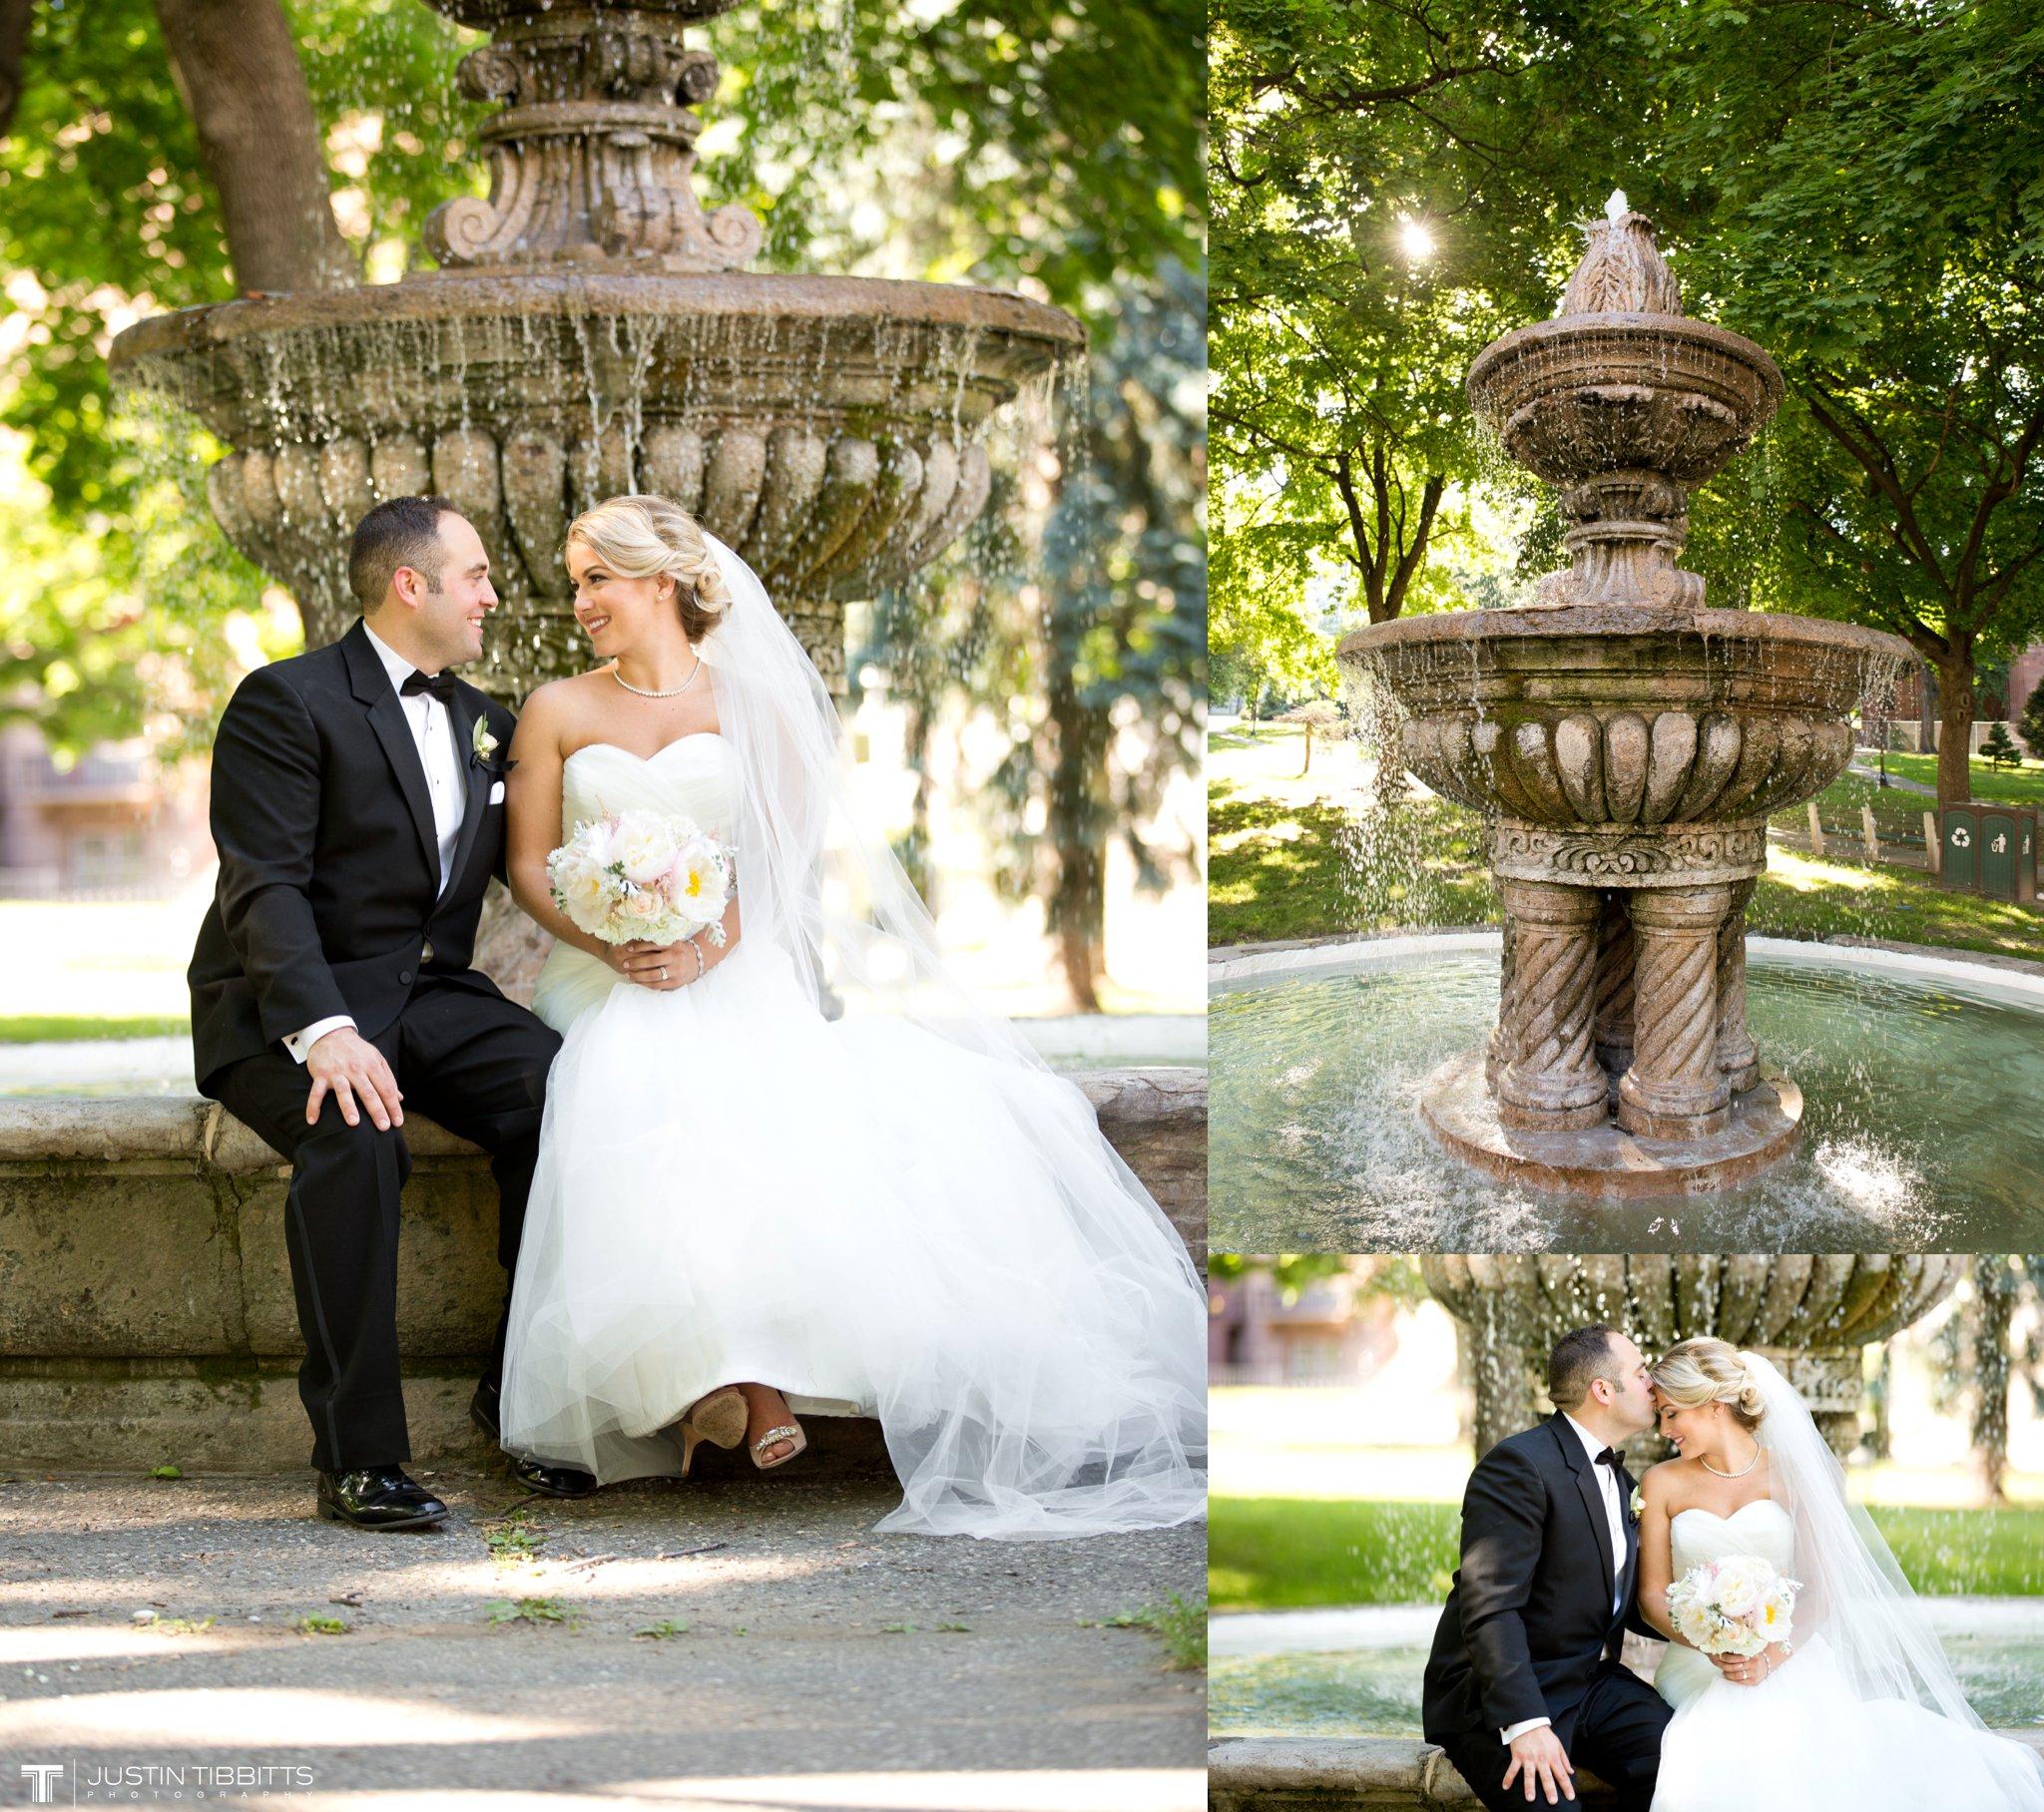 state-room-wedding-photos-with-amanda-and-nick_0107